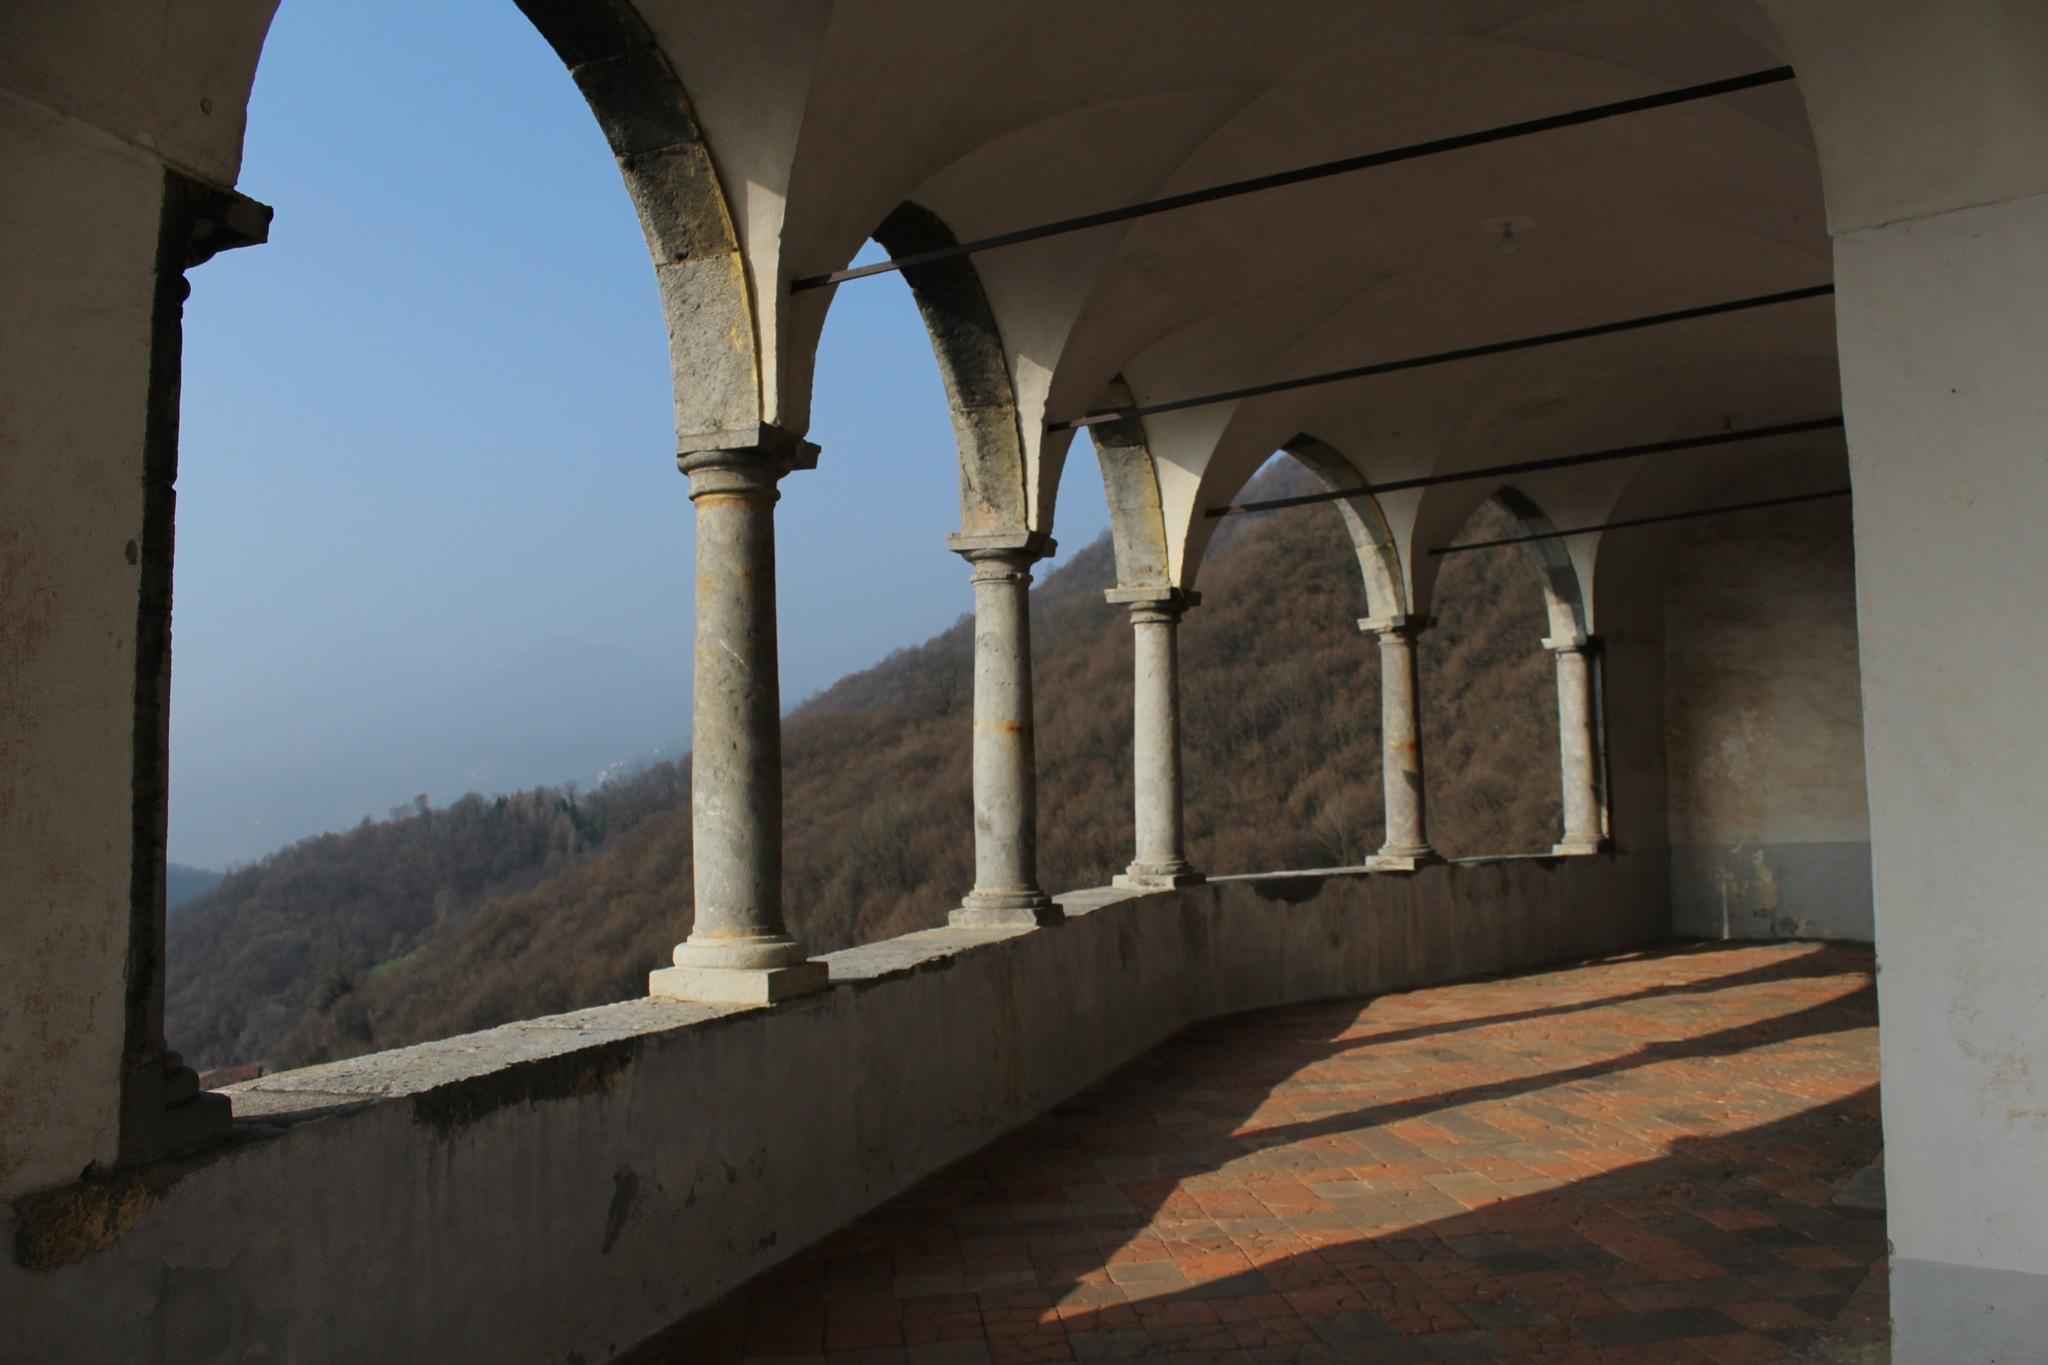 Santuario di San Patrizio, Colzate BG by saraorler